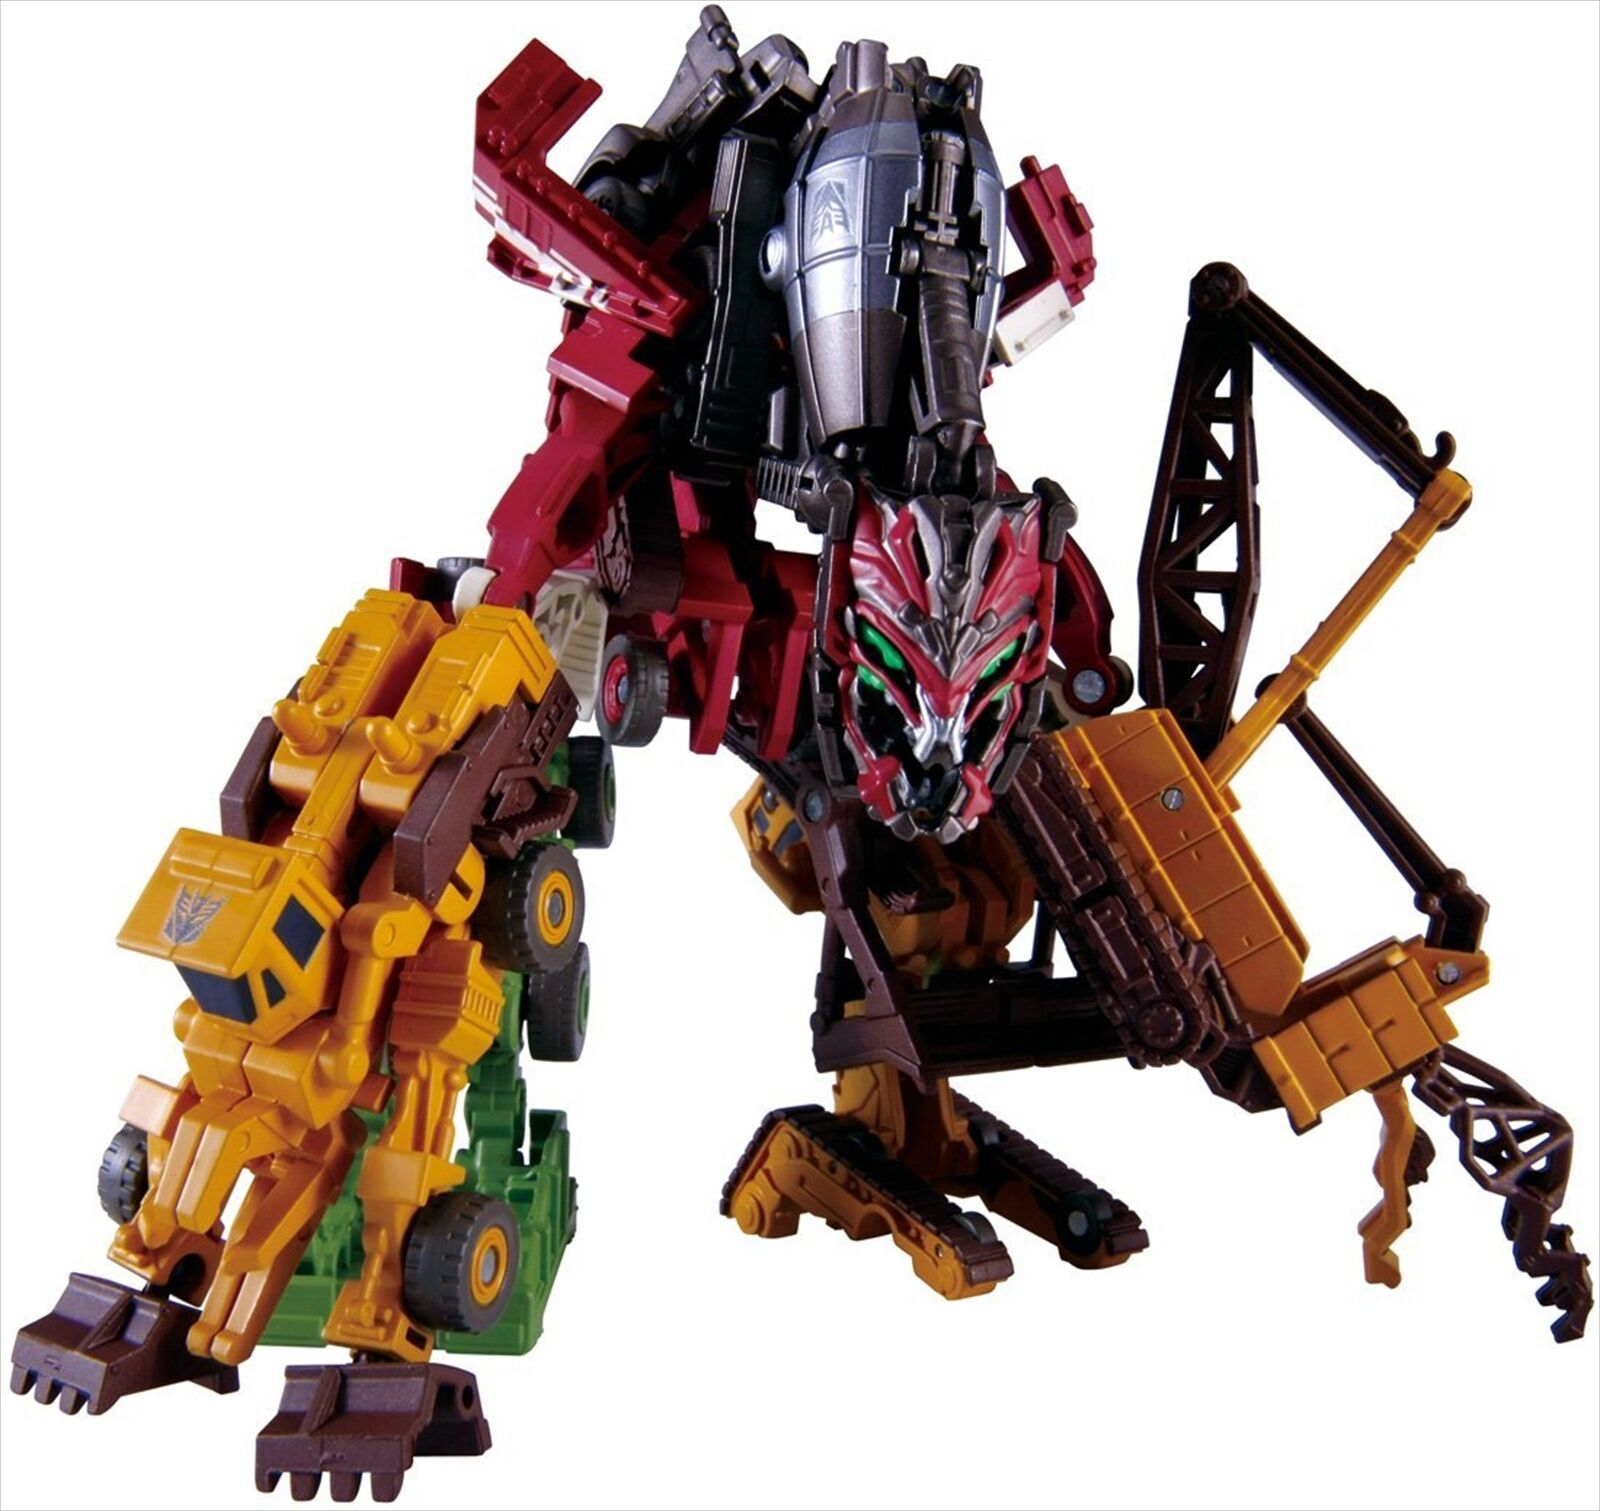 Takara Tomy Transformers Movie Advanced Series AD13 Devastator Action Figure